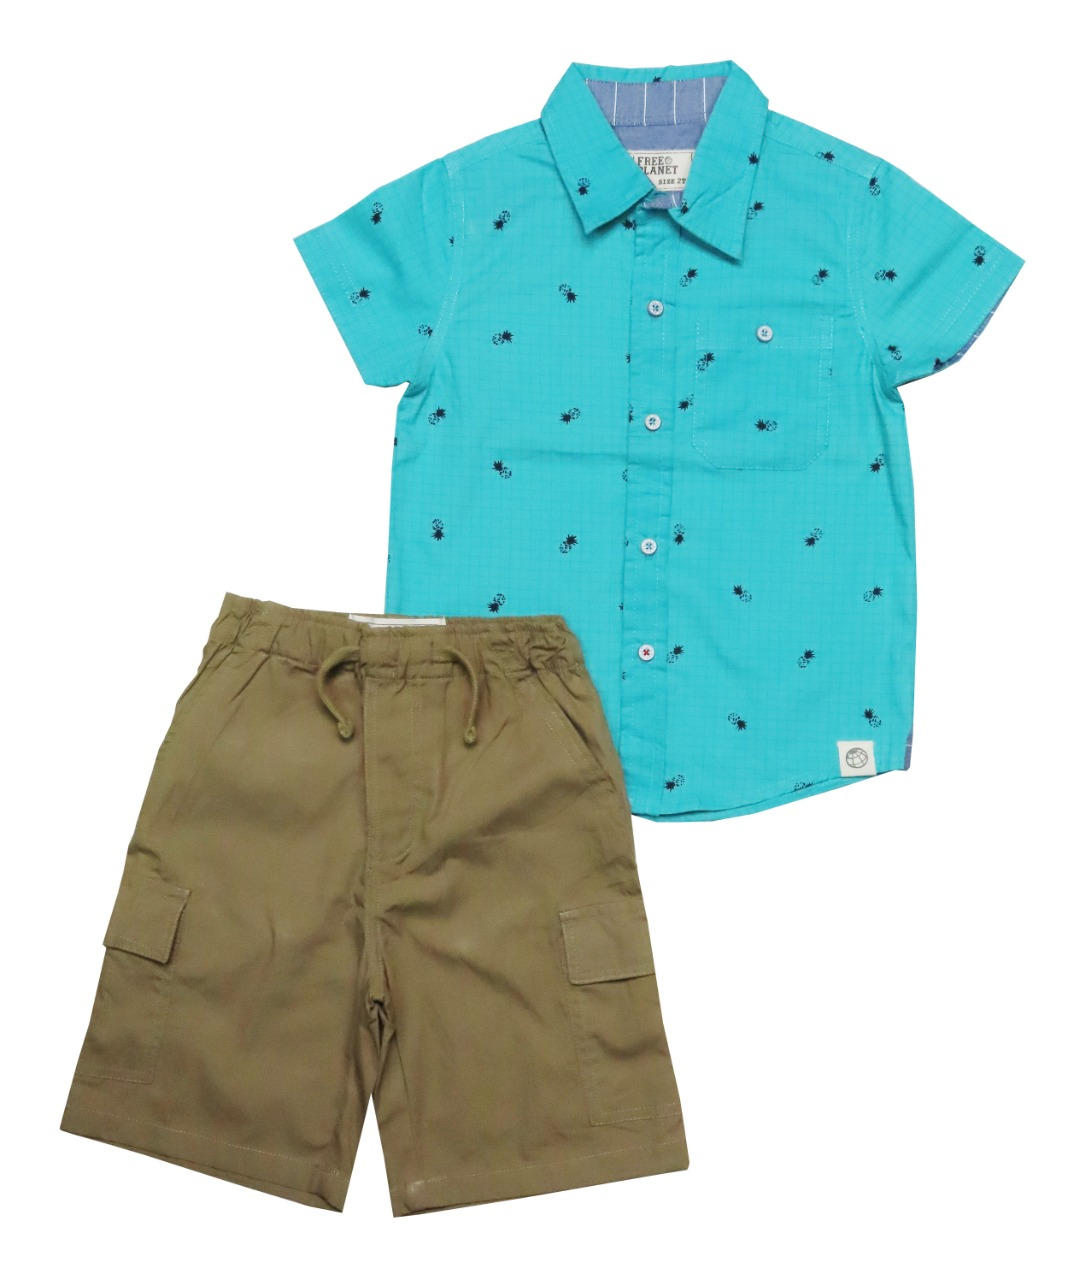 Boys 2 pcs Set Woven Shirt + Woven Shorts